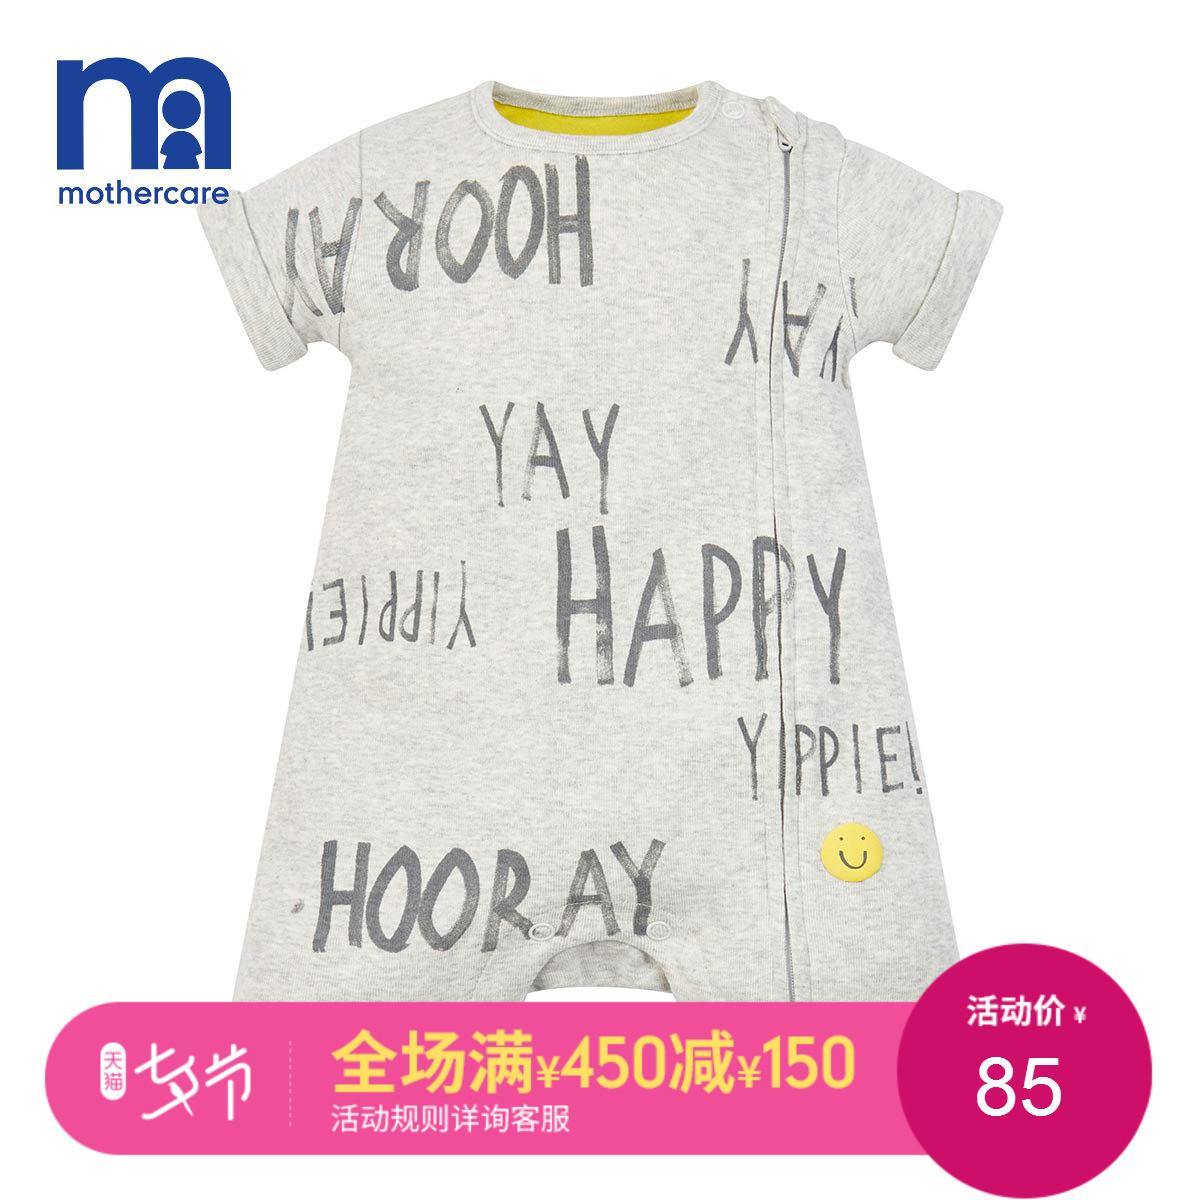 mothercare新生的儿宝宝衣服春夏男婴儿棉质短袖字母笑脸图案哈衣